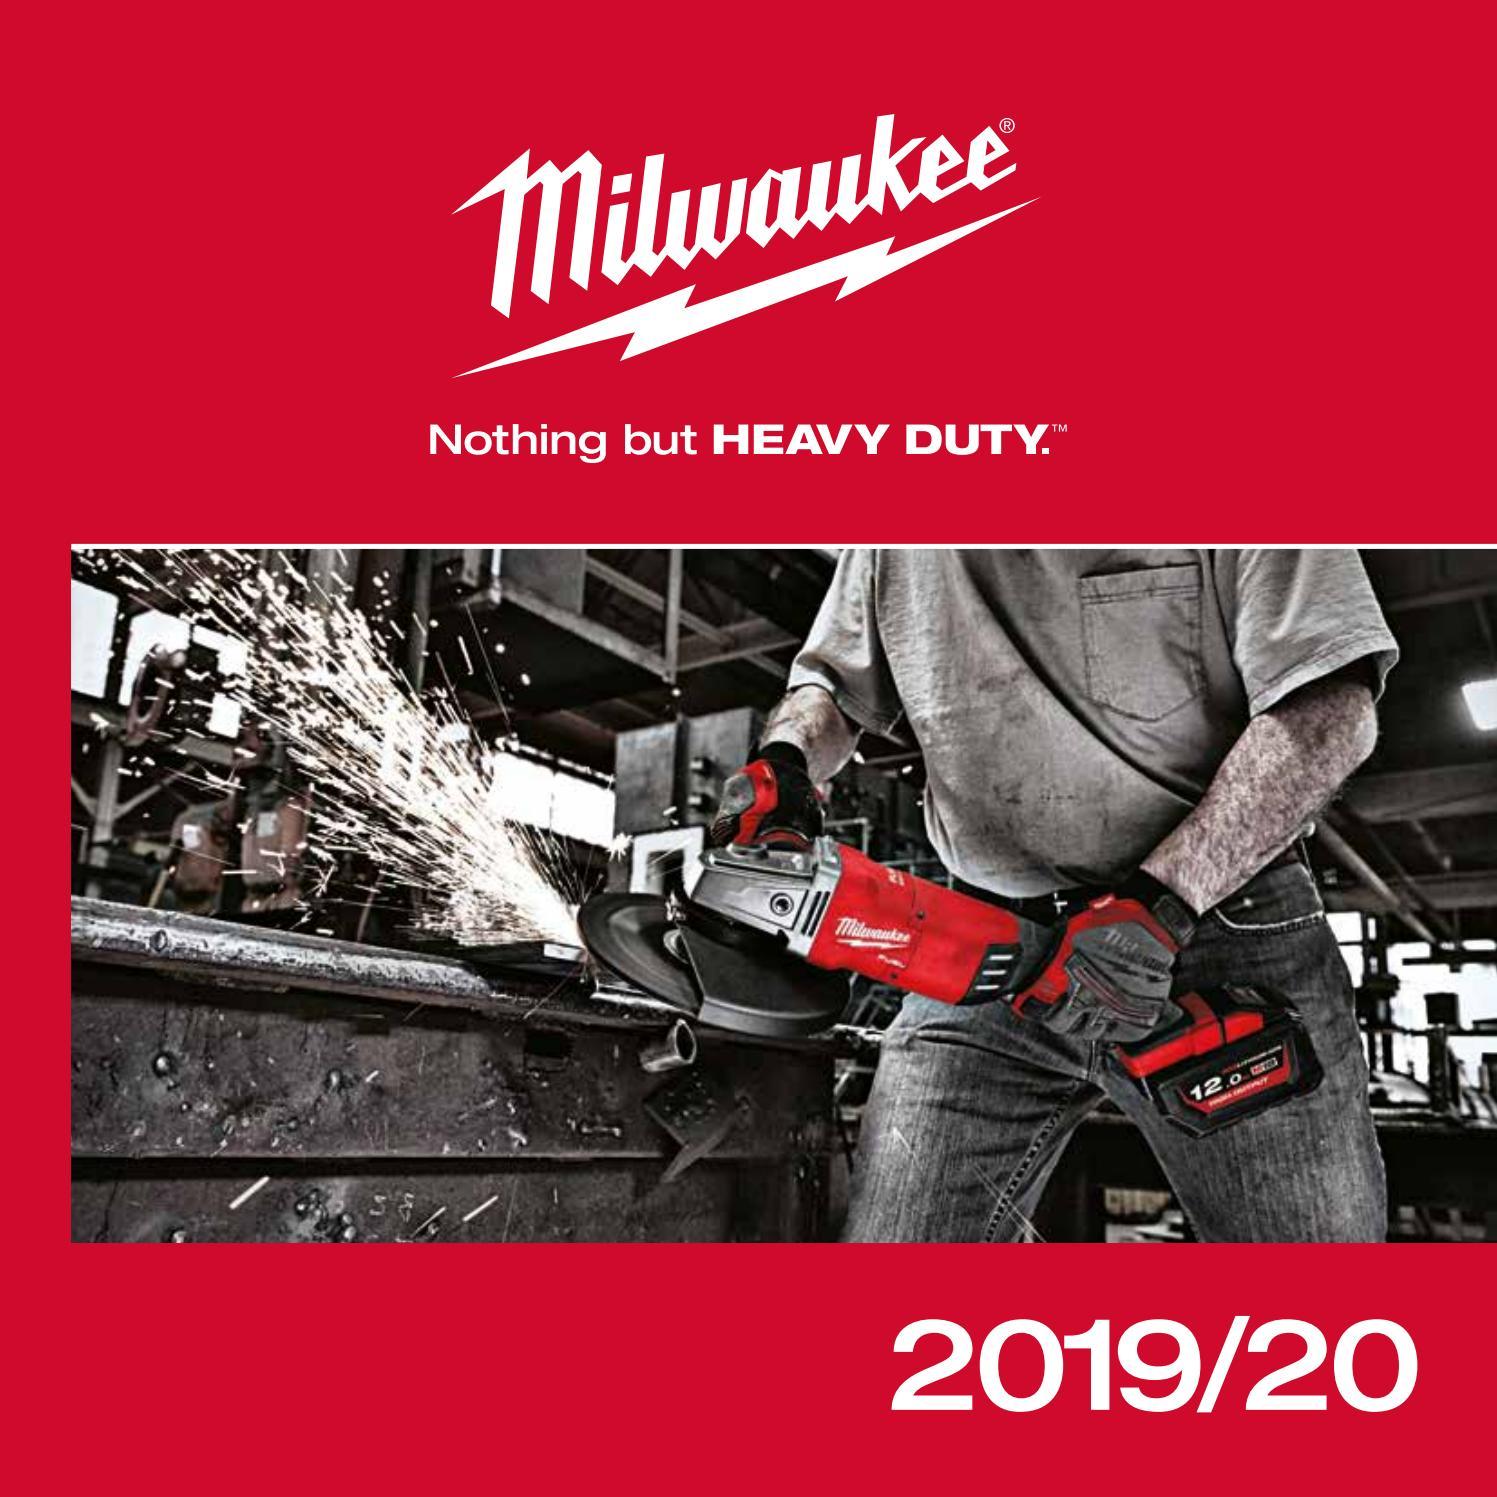 542c753f7851c Katalog Millwaukee 2019 / 2020 by Beha Tech - issuu